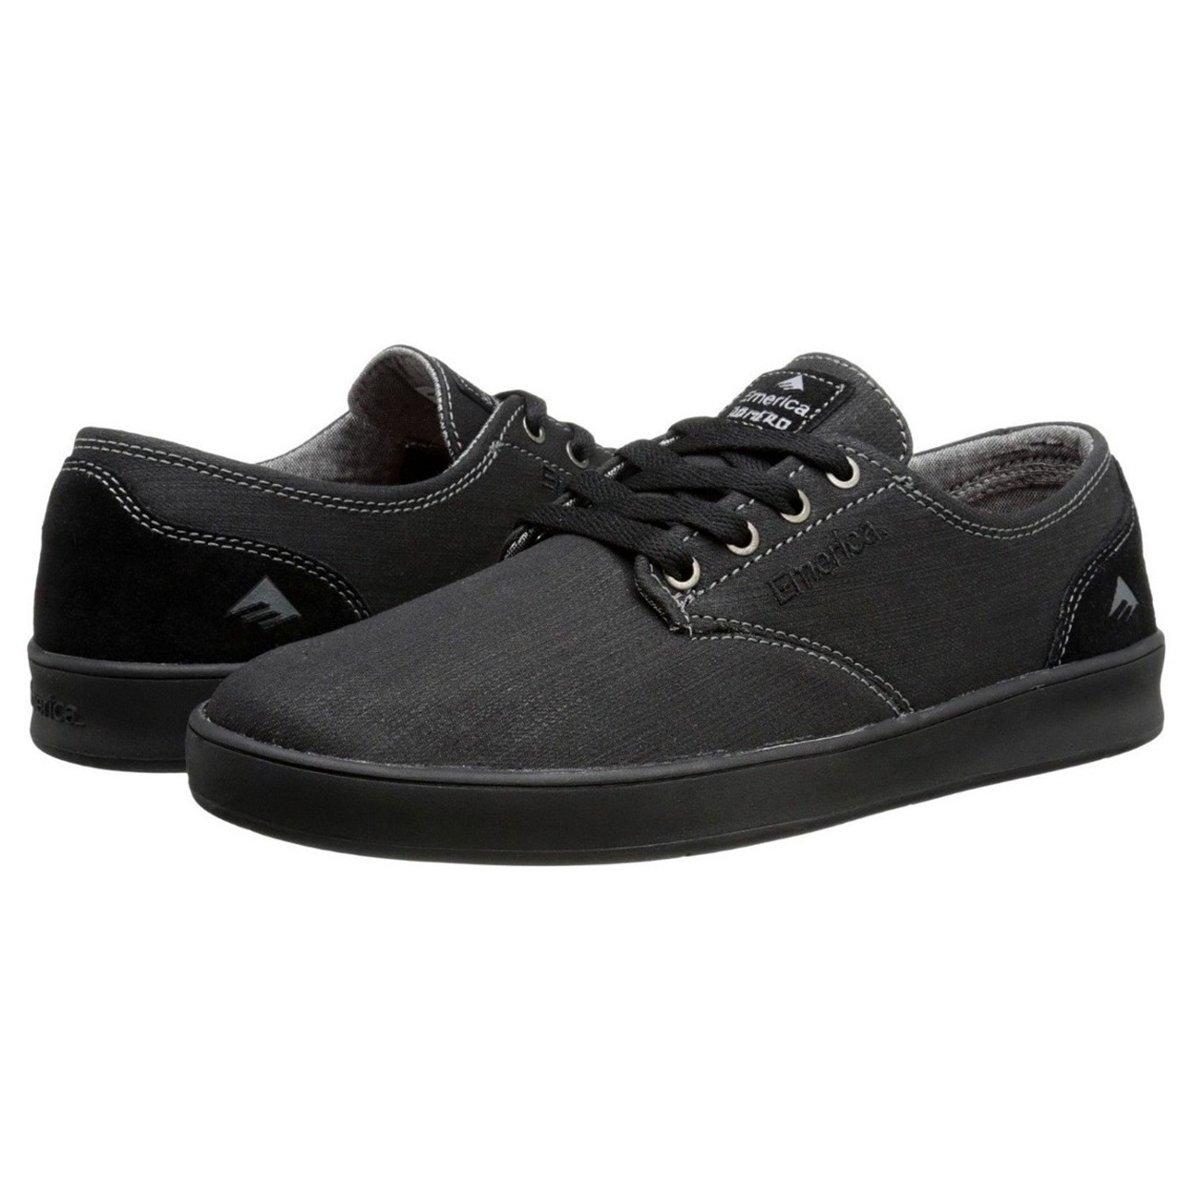 Tênis Skate Emerica The Romero All Black Import - Preto